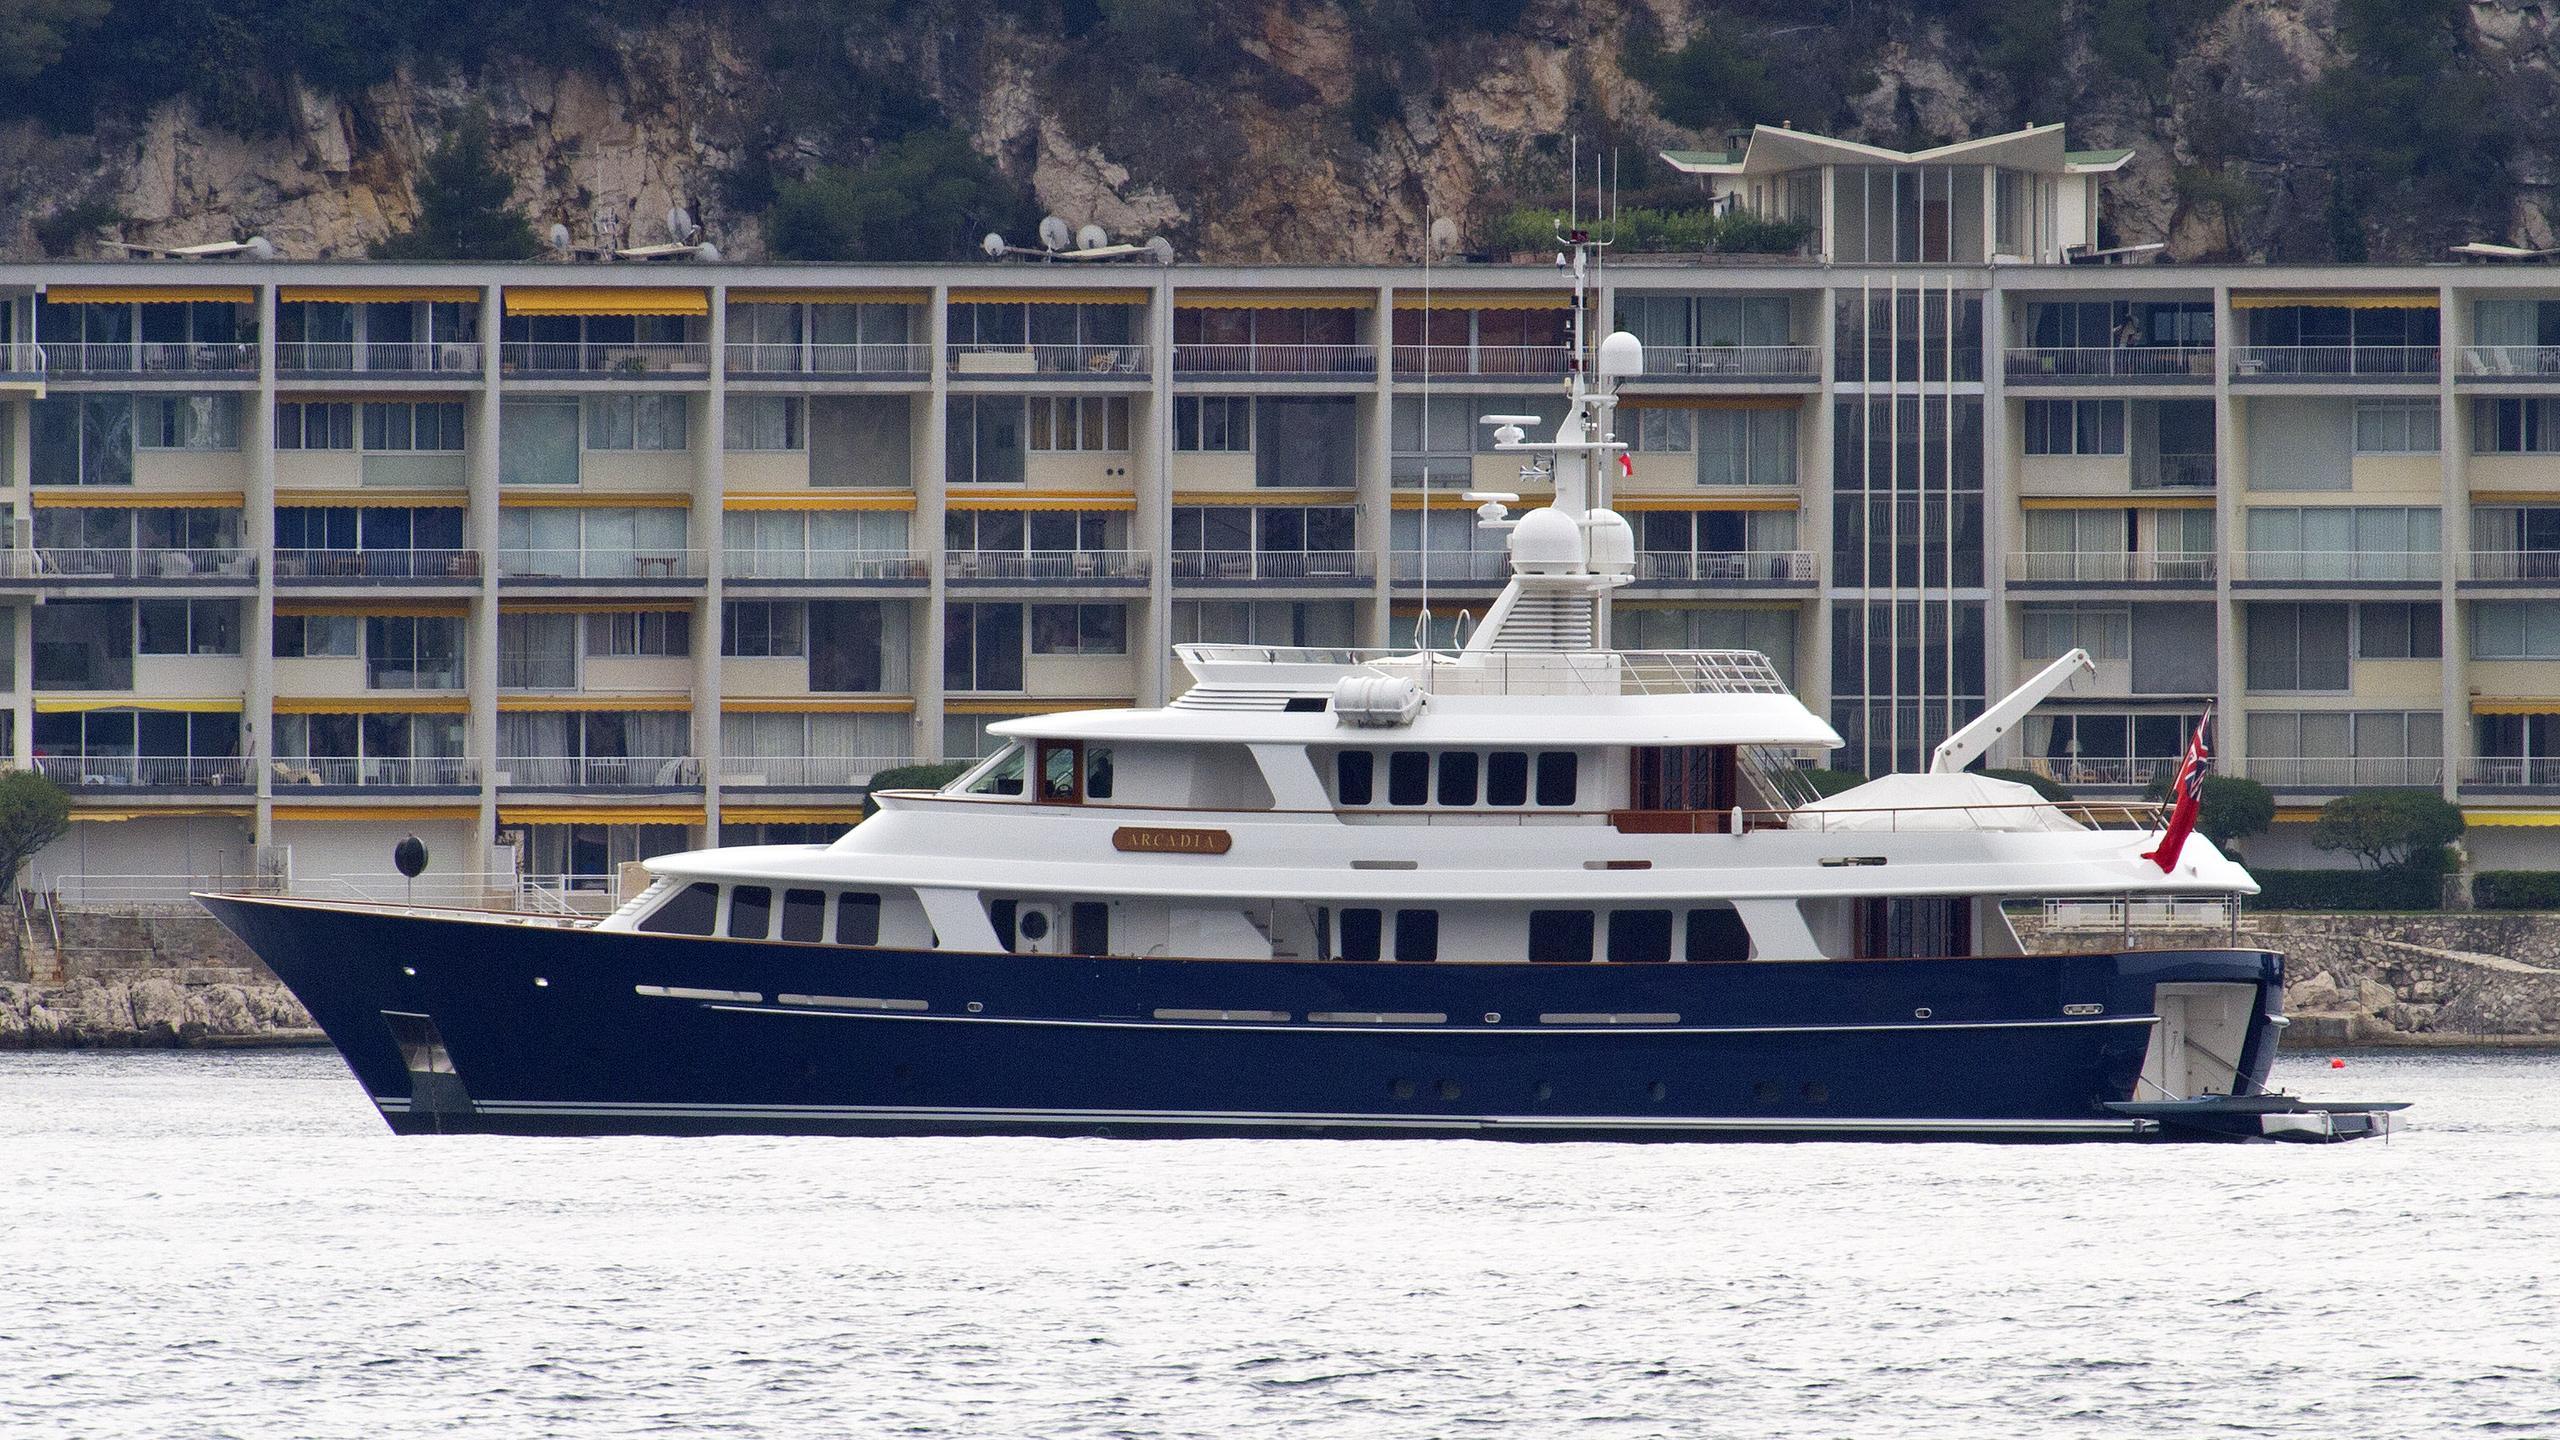 arcadia-motor-yacht-royal-huisman-2006-36m-profile